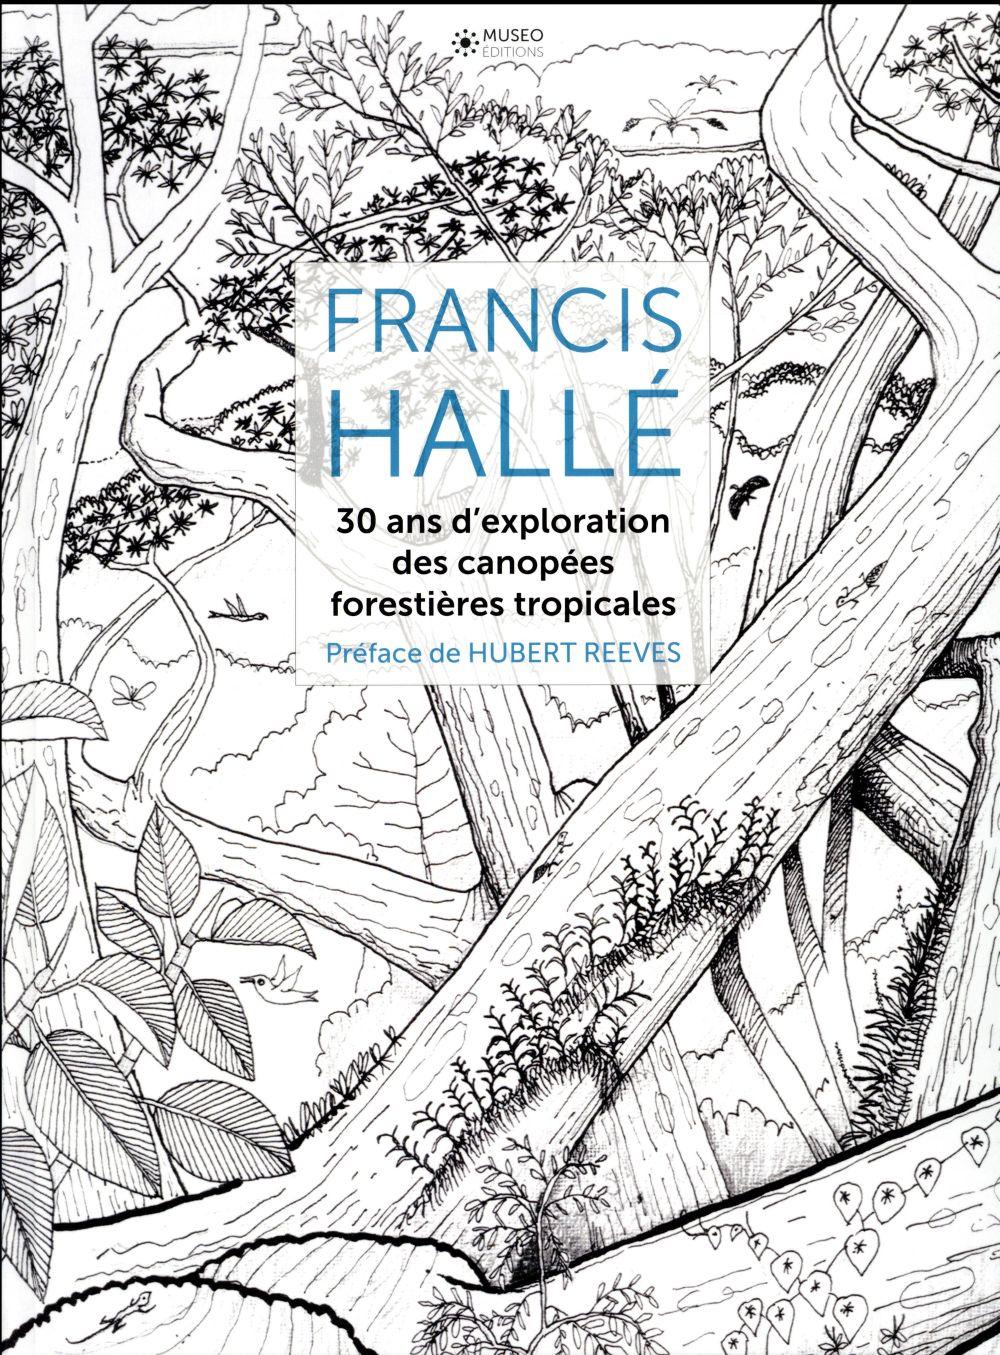 FRANCIS HALLE, 30 ANS D'EXPLORATION DES CANOPEES FORESTIERES TROPICALES